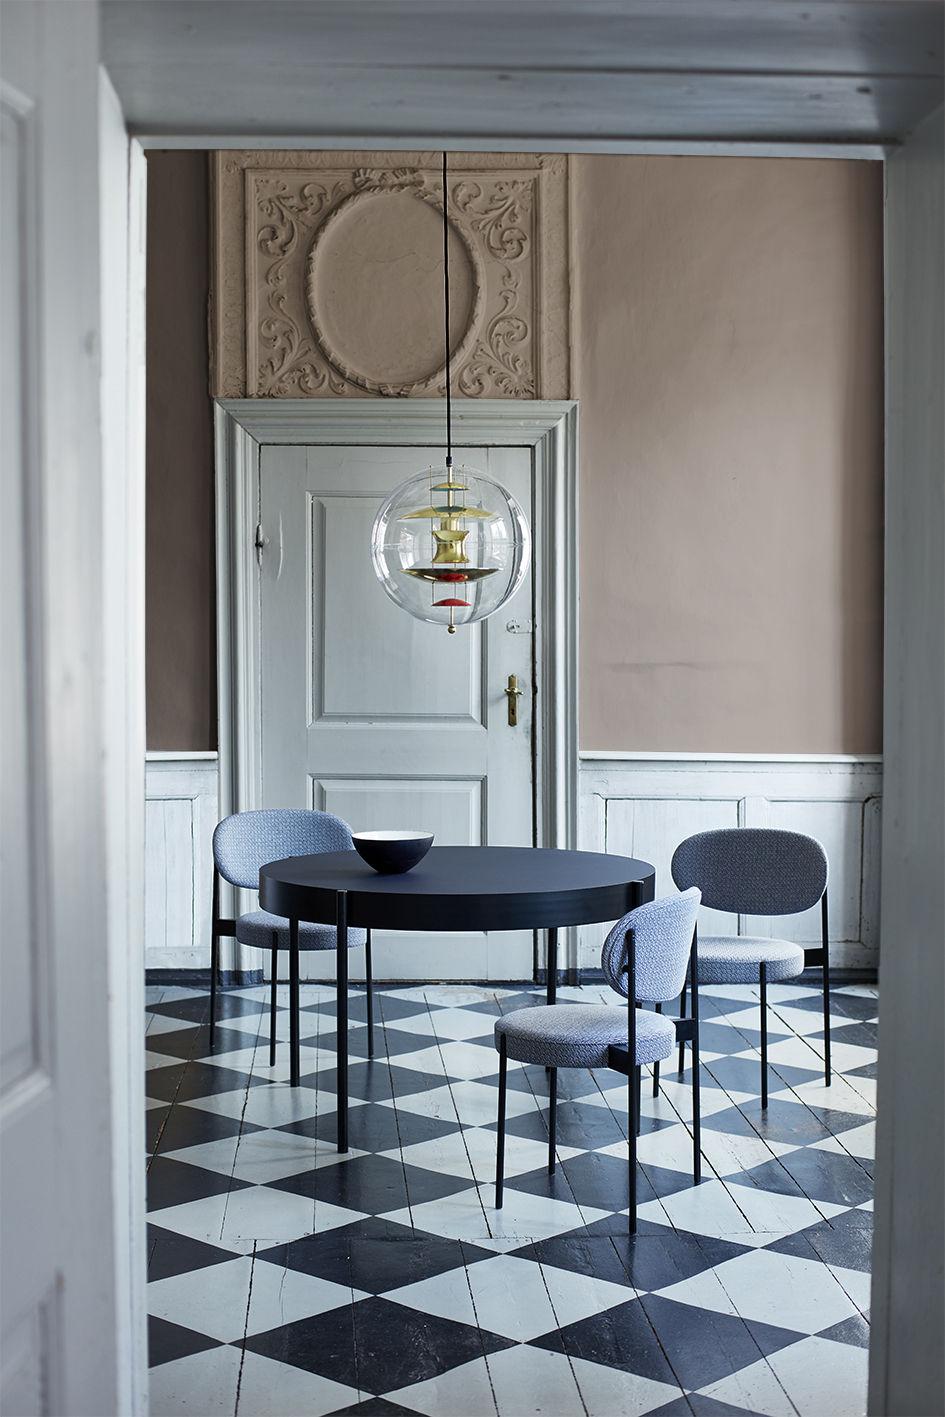 series 430 gepolsterter stuhl velours velours ockergelb by verpan made in design. Black Bedroom Furniture Sets. Home Design Ideas